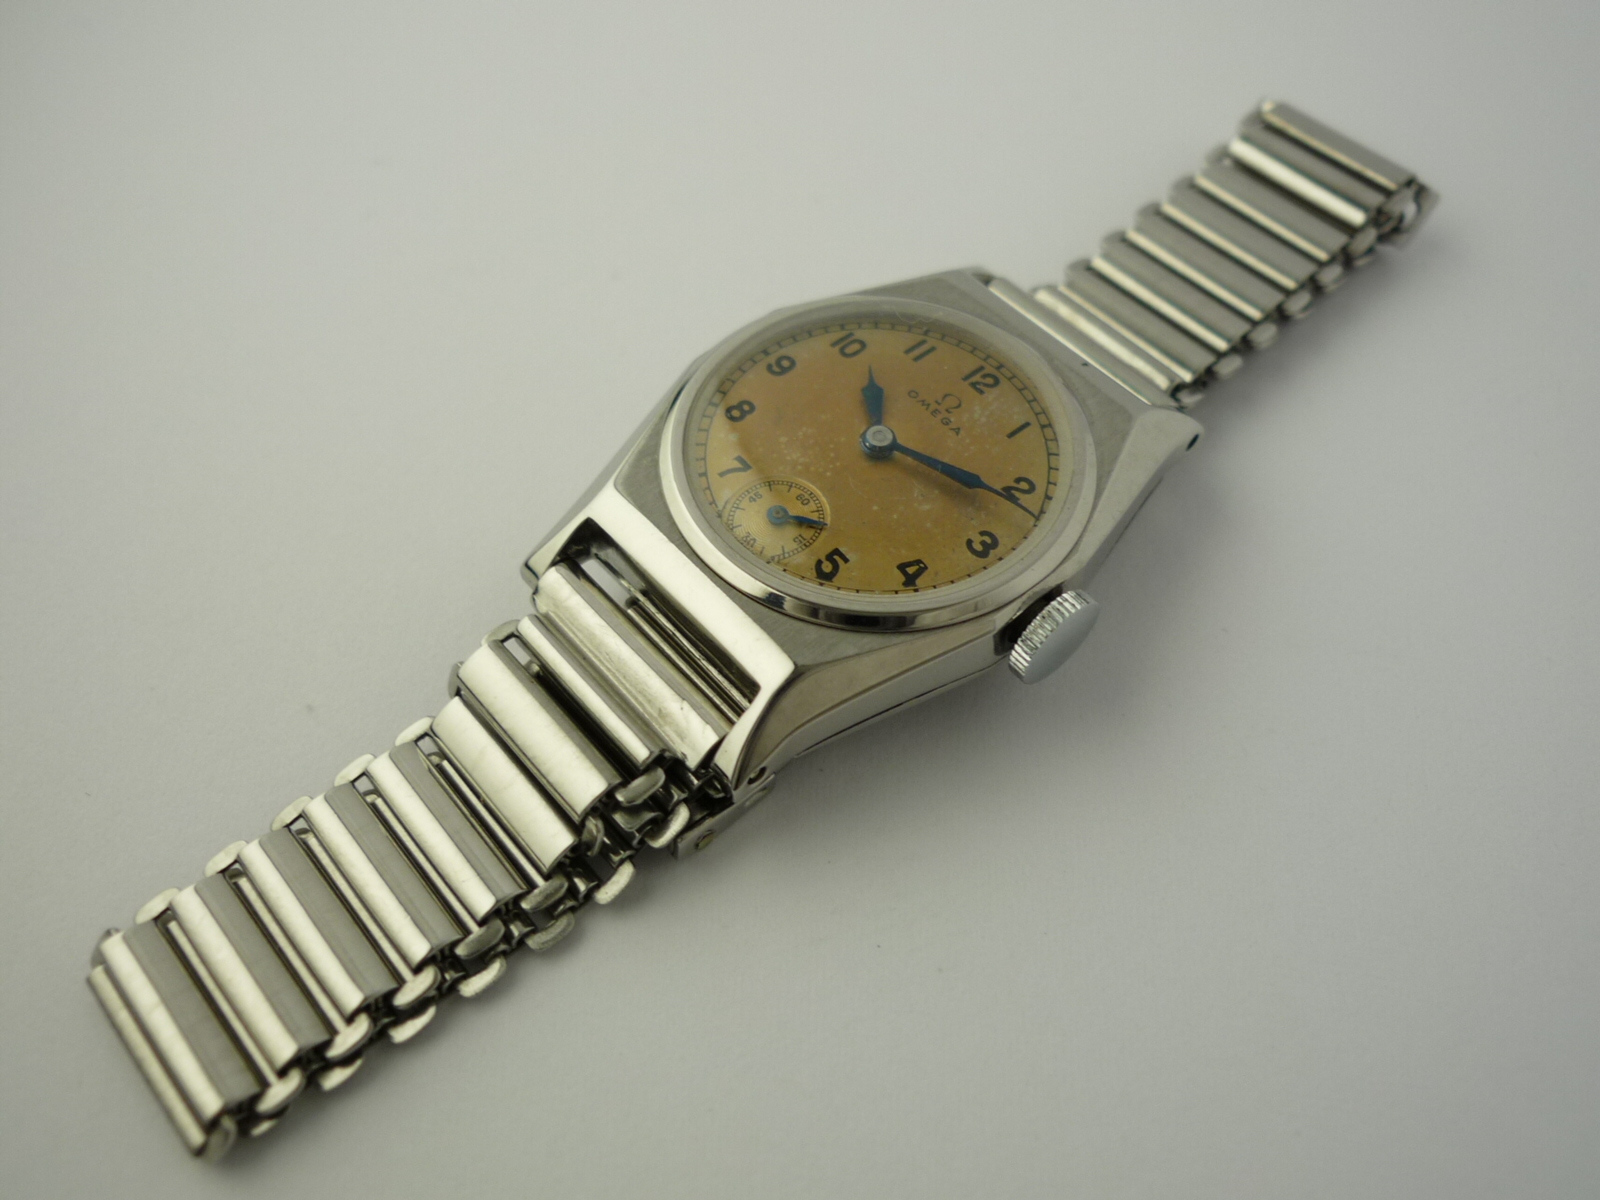 Vintage Omega Art Deco Design wristwatch (1939)